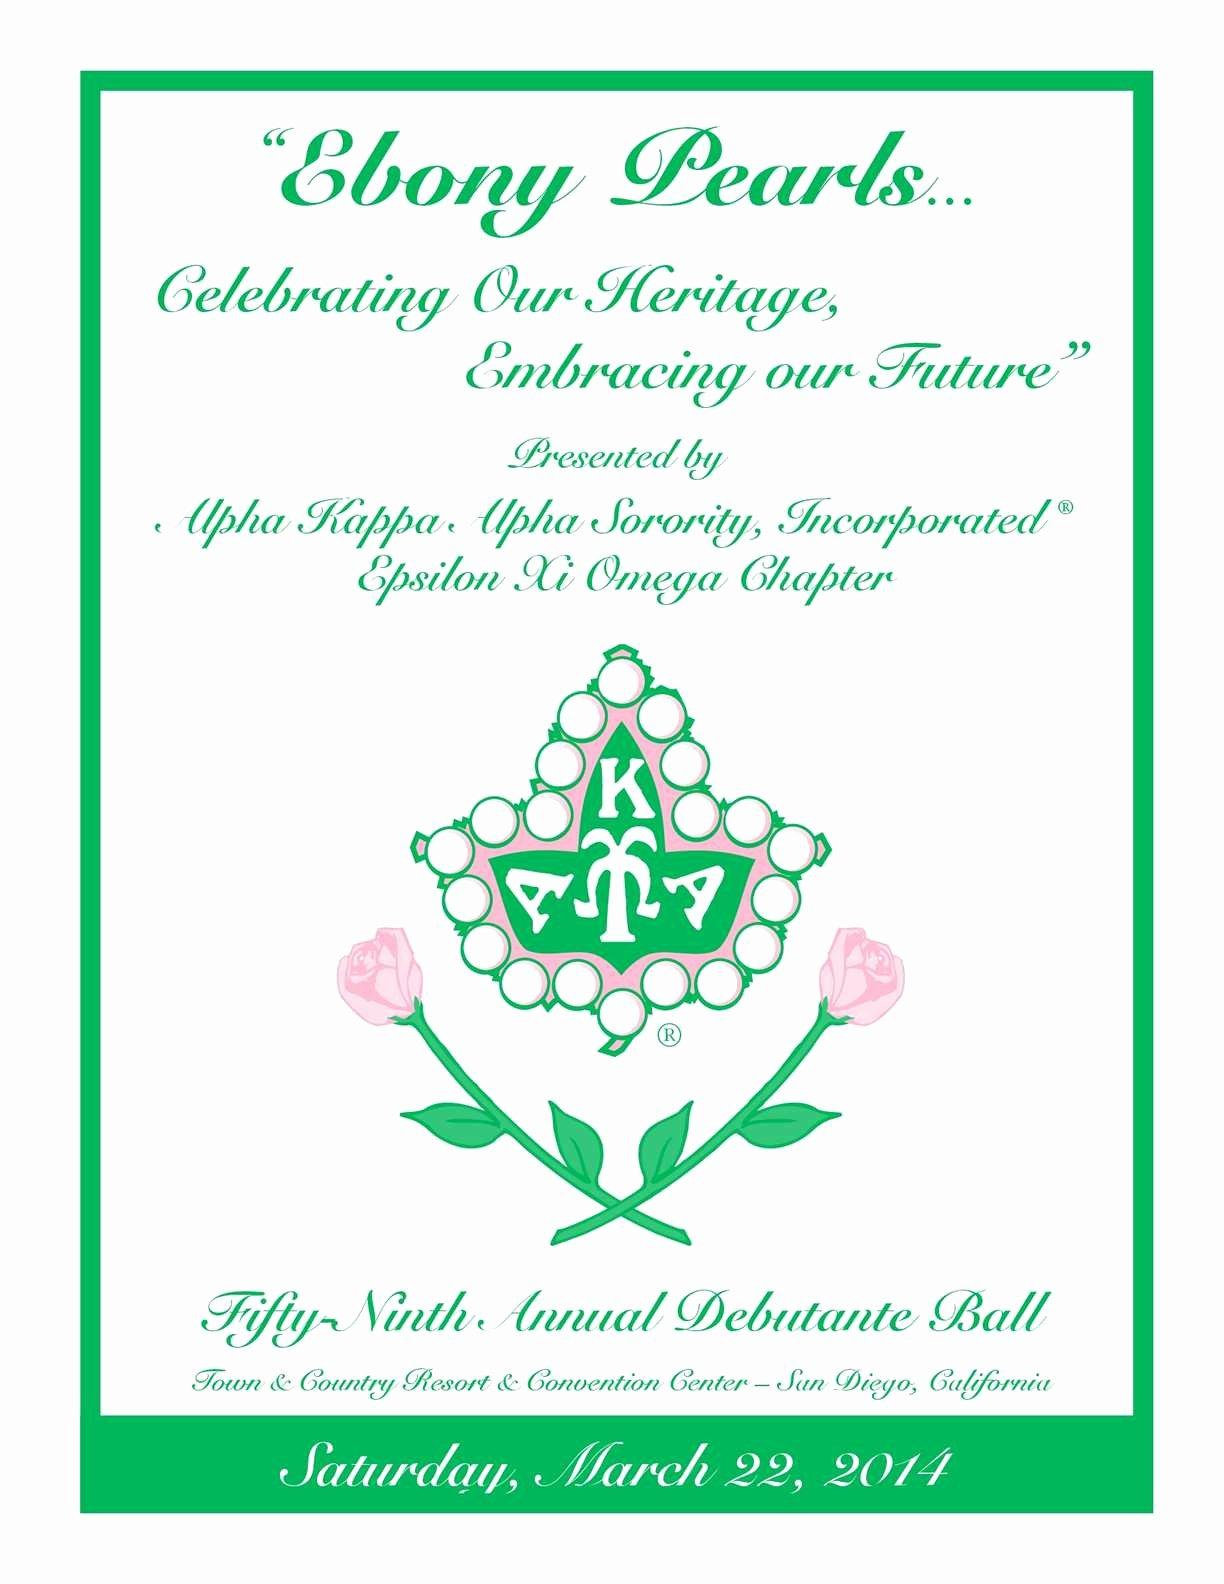 Souvenir Booklet Template Microsoft Word Beautiful Debutante Cotillion souvenir Book Ad Template